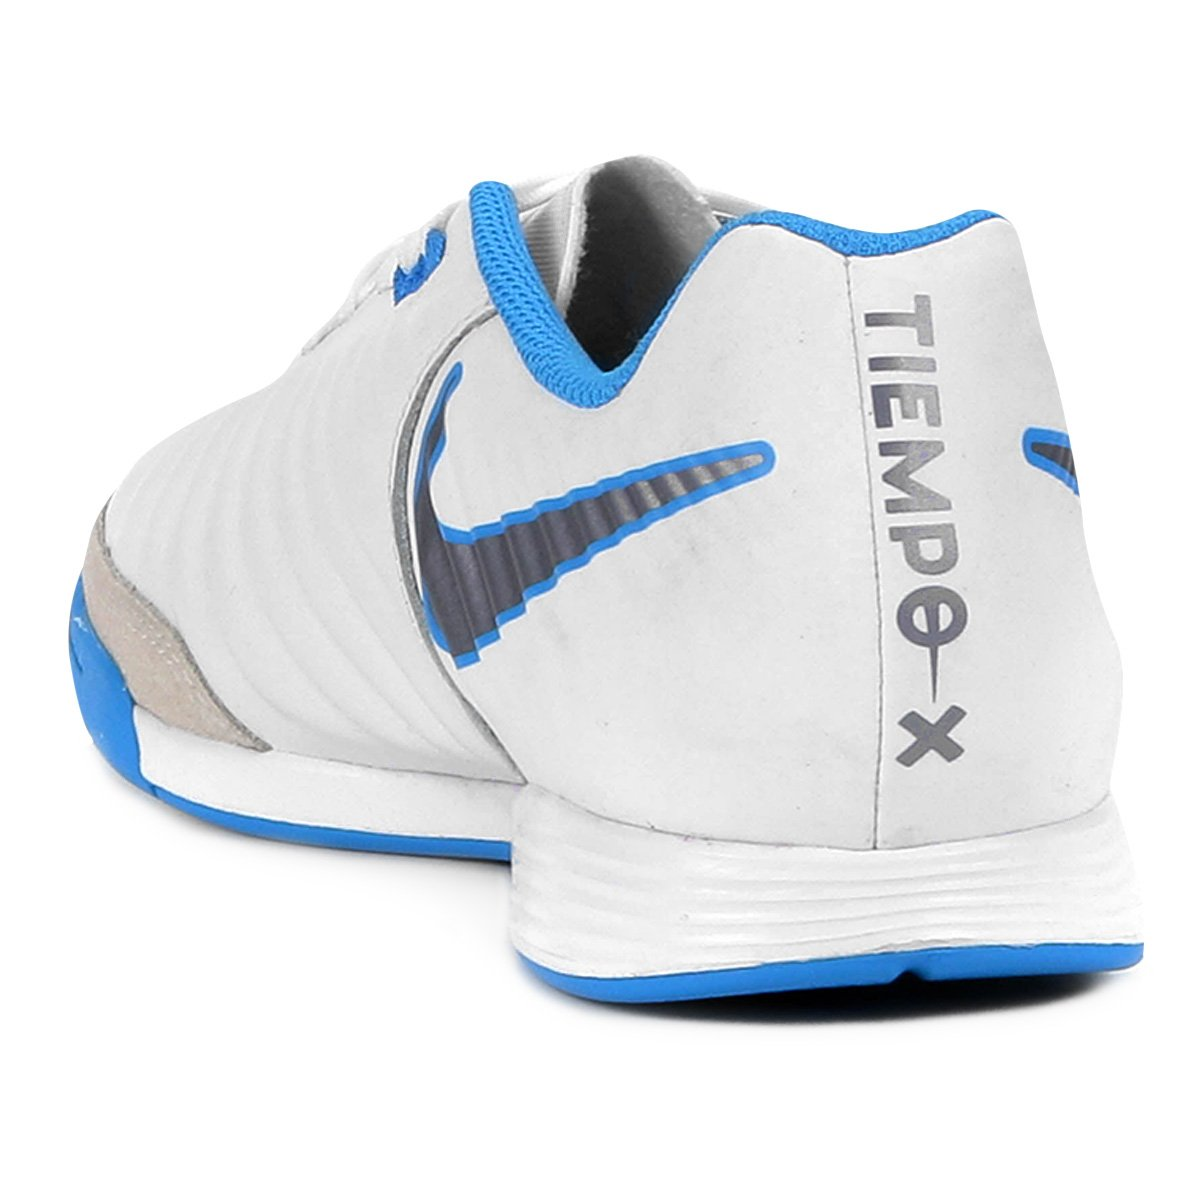 1c926b9f8a Chuteira Futsal Nike Tiempo Legend 7 Academy IC - Branco e Azul ...